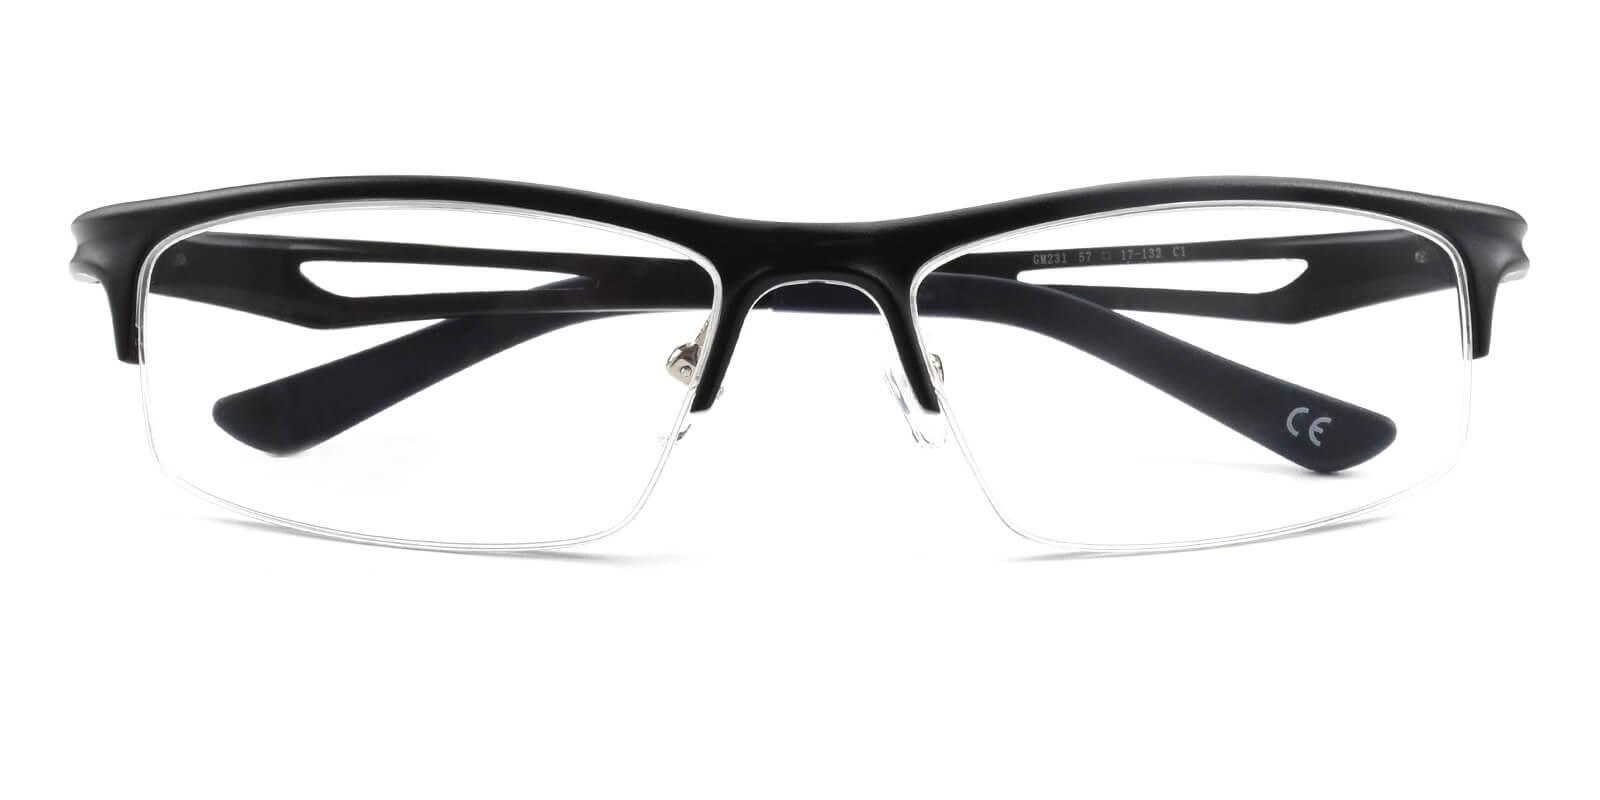 Muhammad-Black-Rectangle-Metal-Eyeglasses-detail